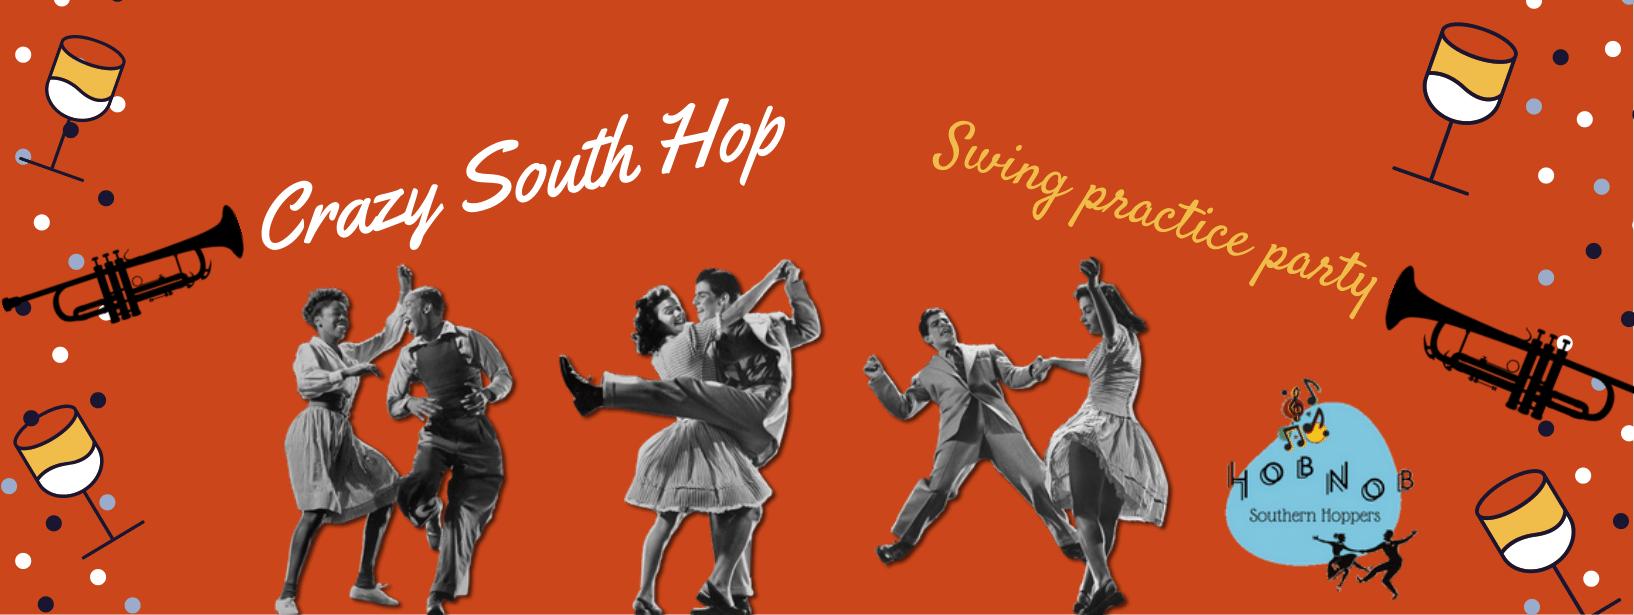 Swing practice party στο Hobnob για καλό σκοπό @ Hobnob